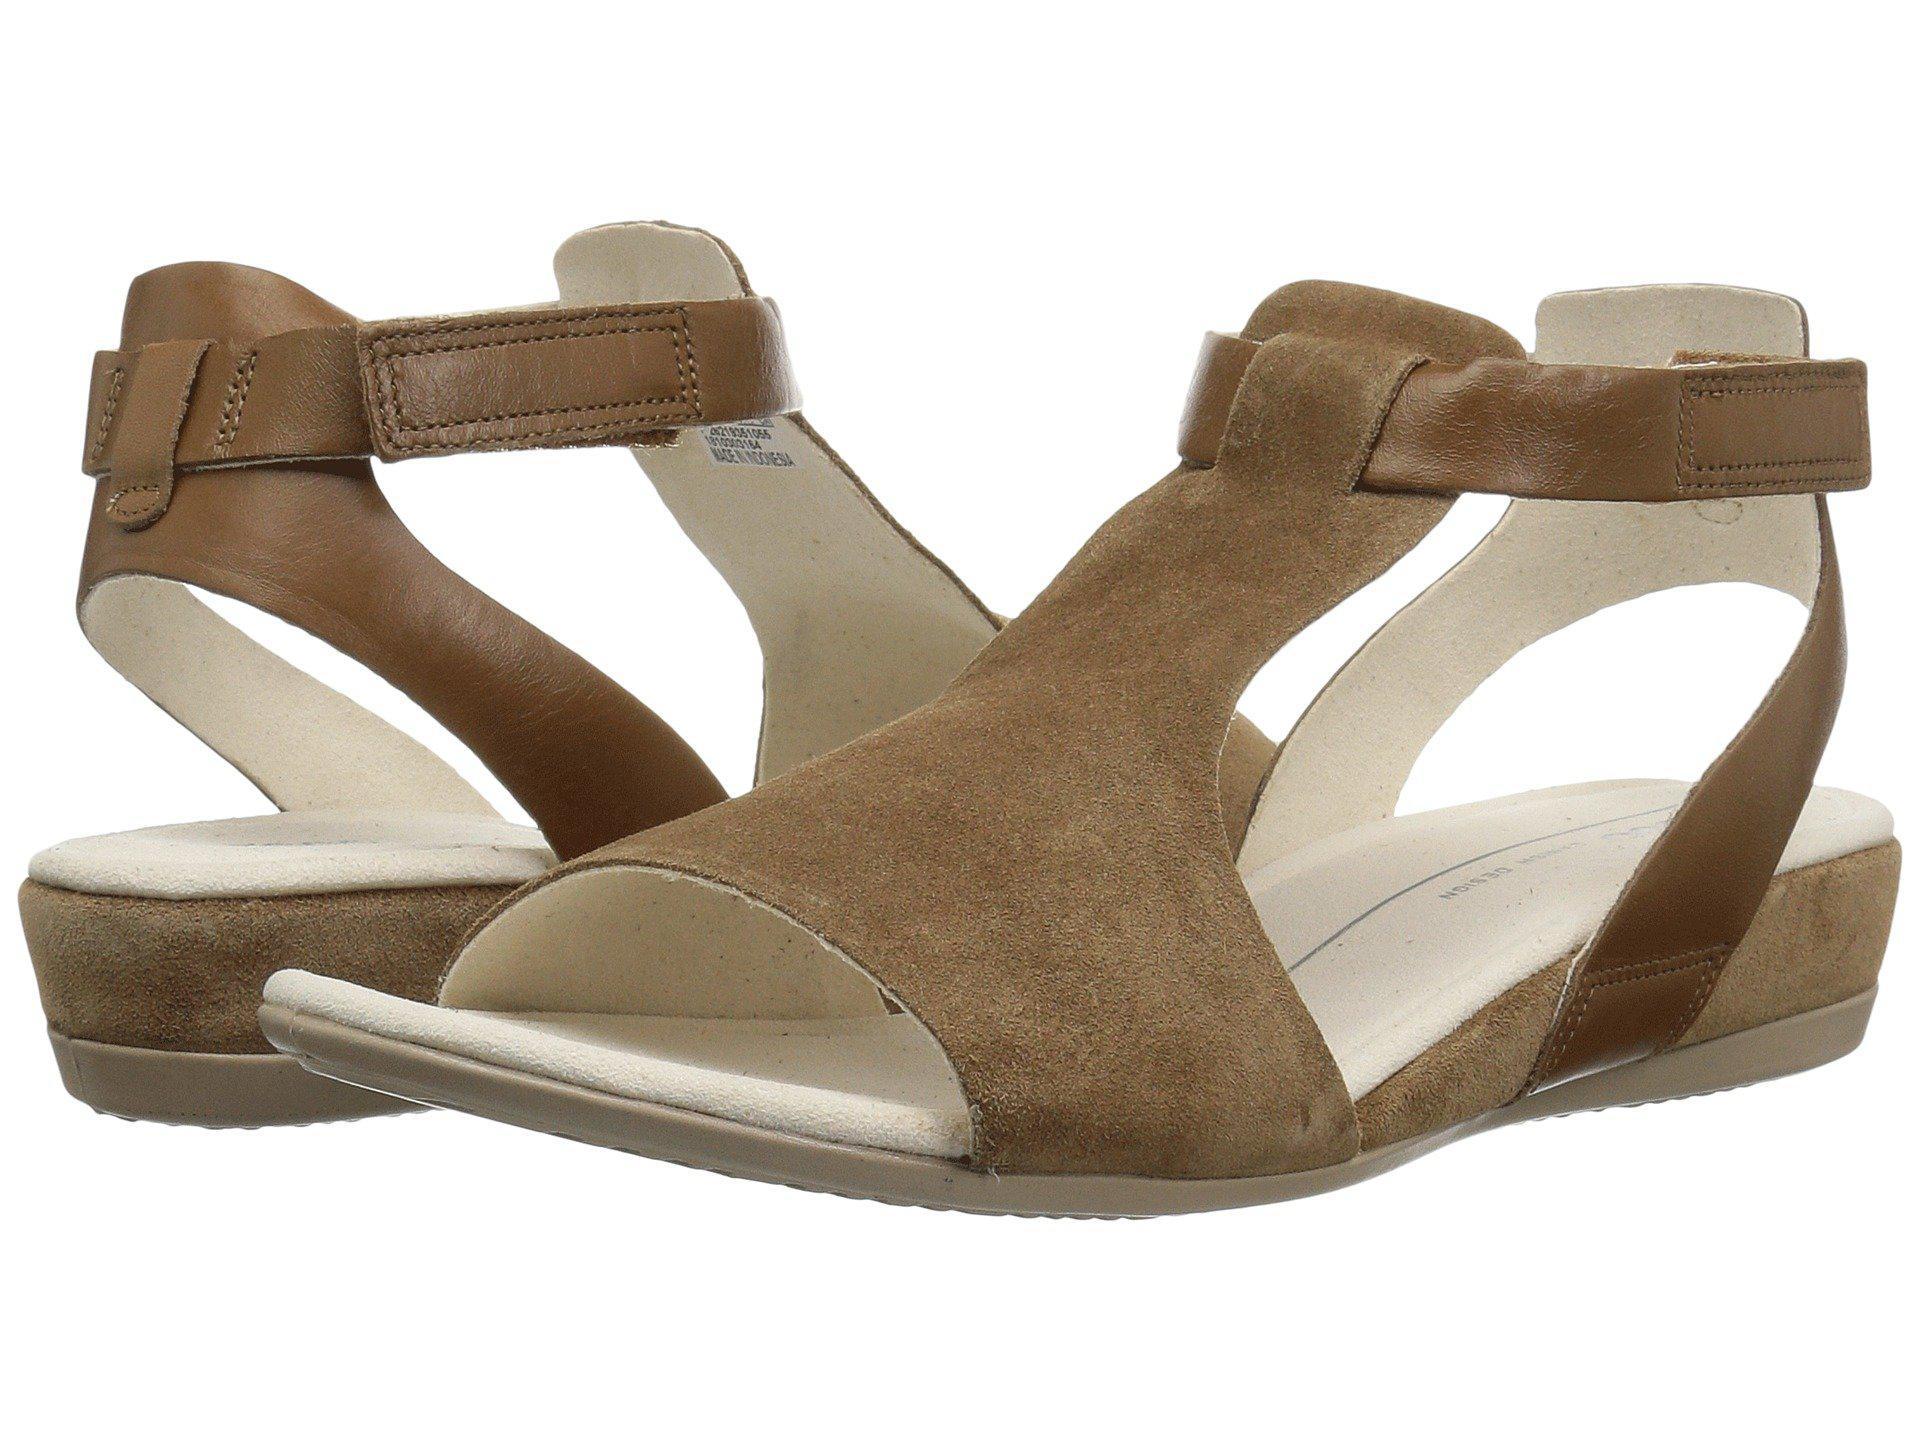 0a3b53bd1da Lyst - Ecco Touch 25 Ankle Sandal (camel camel) Women s Sandals in ...